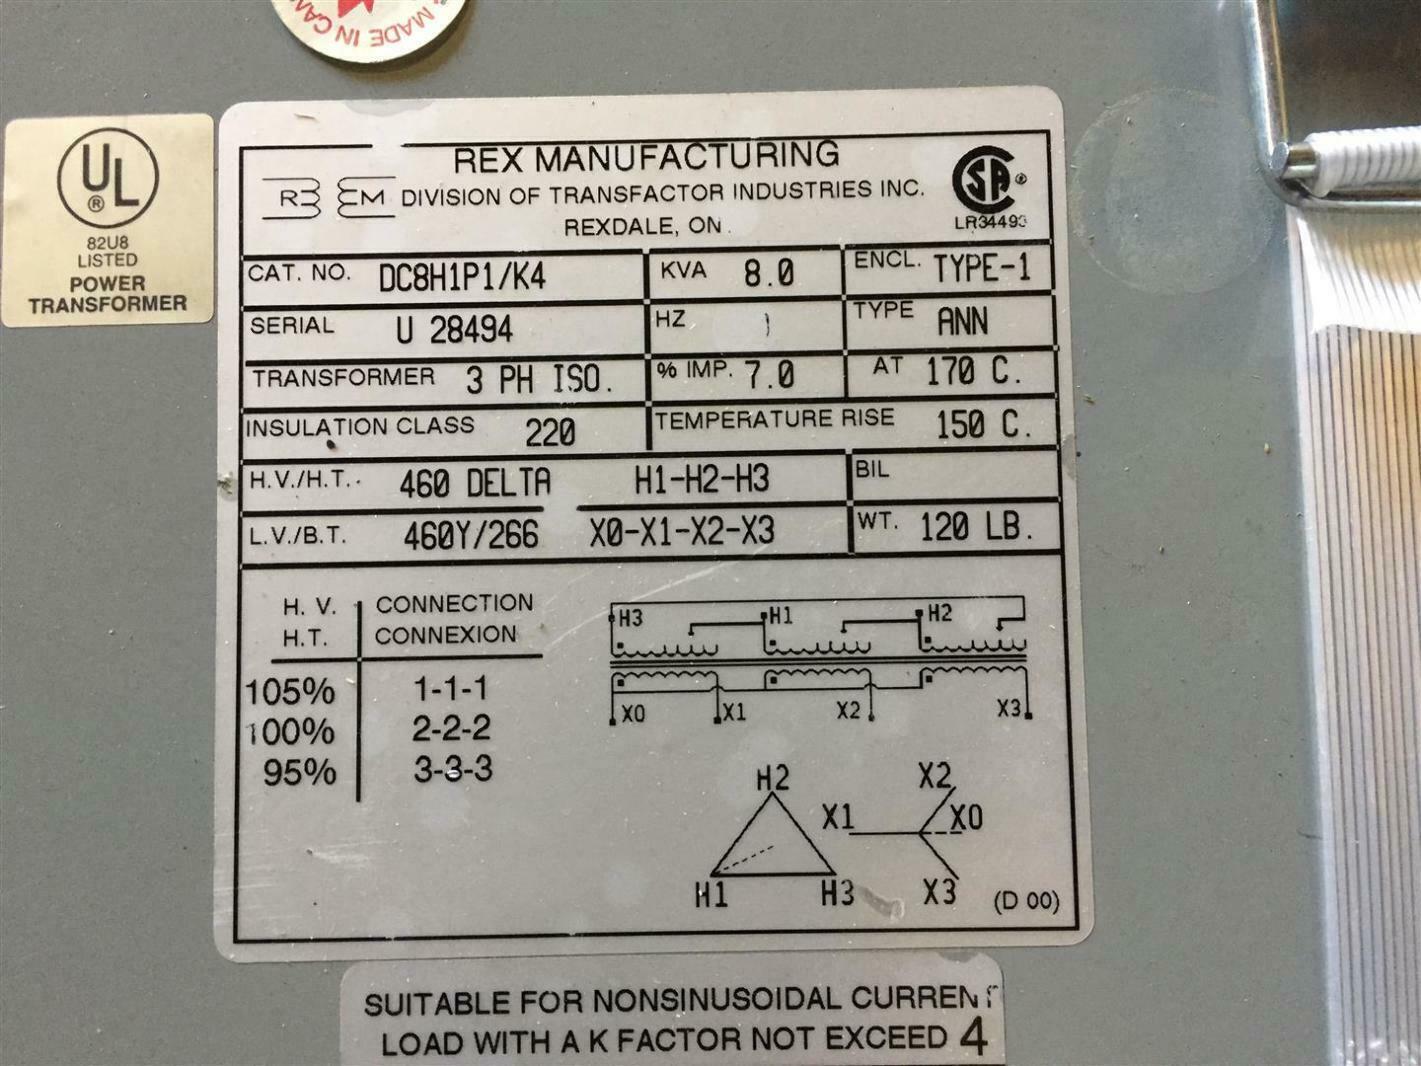 rex manufacturing transformer wiring diagram wiring diagram libraries rex wiring diagram wiring libraryrex power 8kva 460v 3ph 60hz isolation transformer